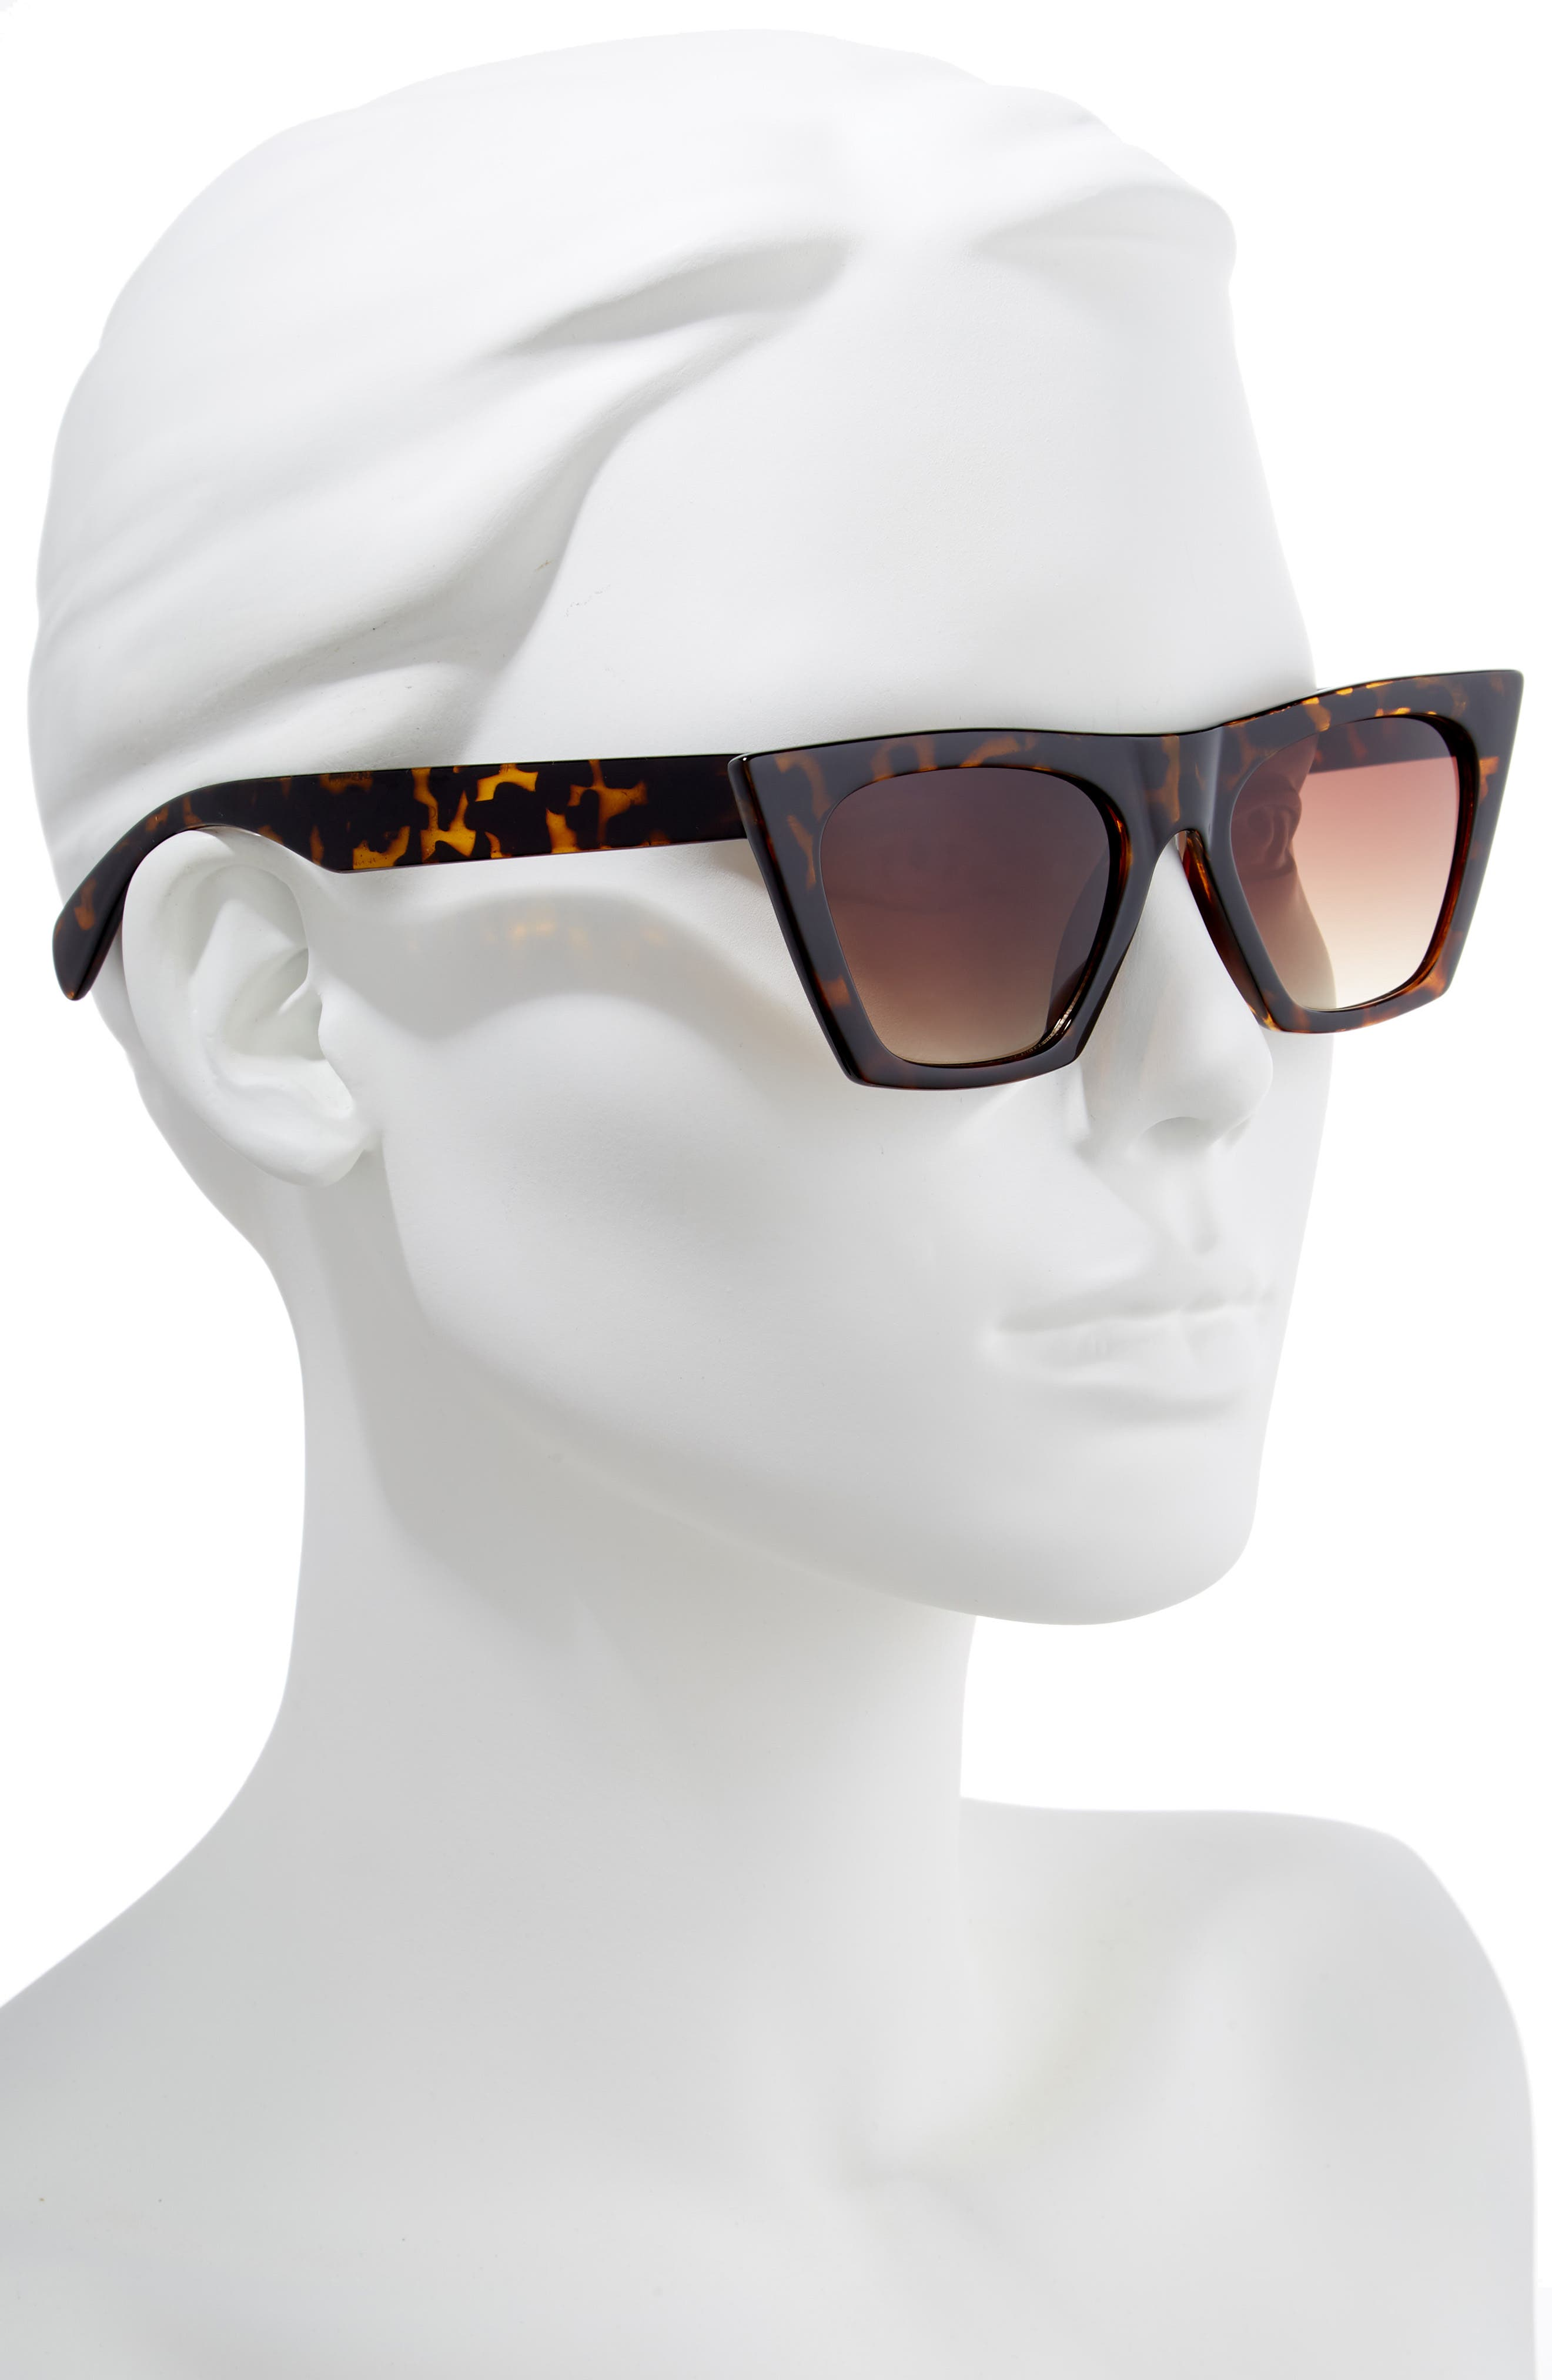 50mm Square Cat Eye Sunglasses,                             Alternate thumbnail 2, color,                             TORTOISE